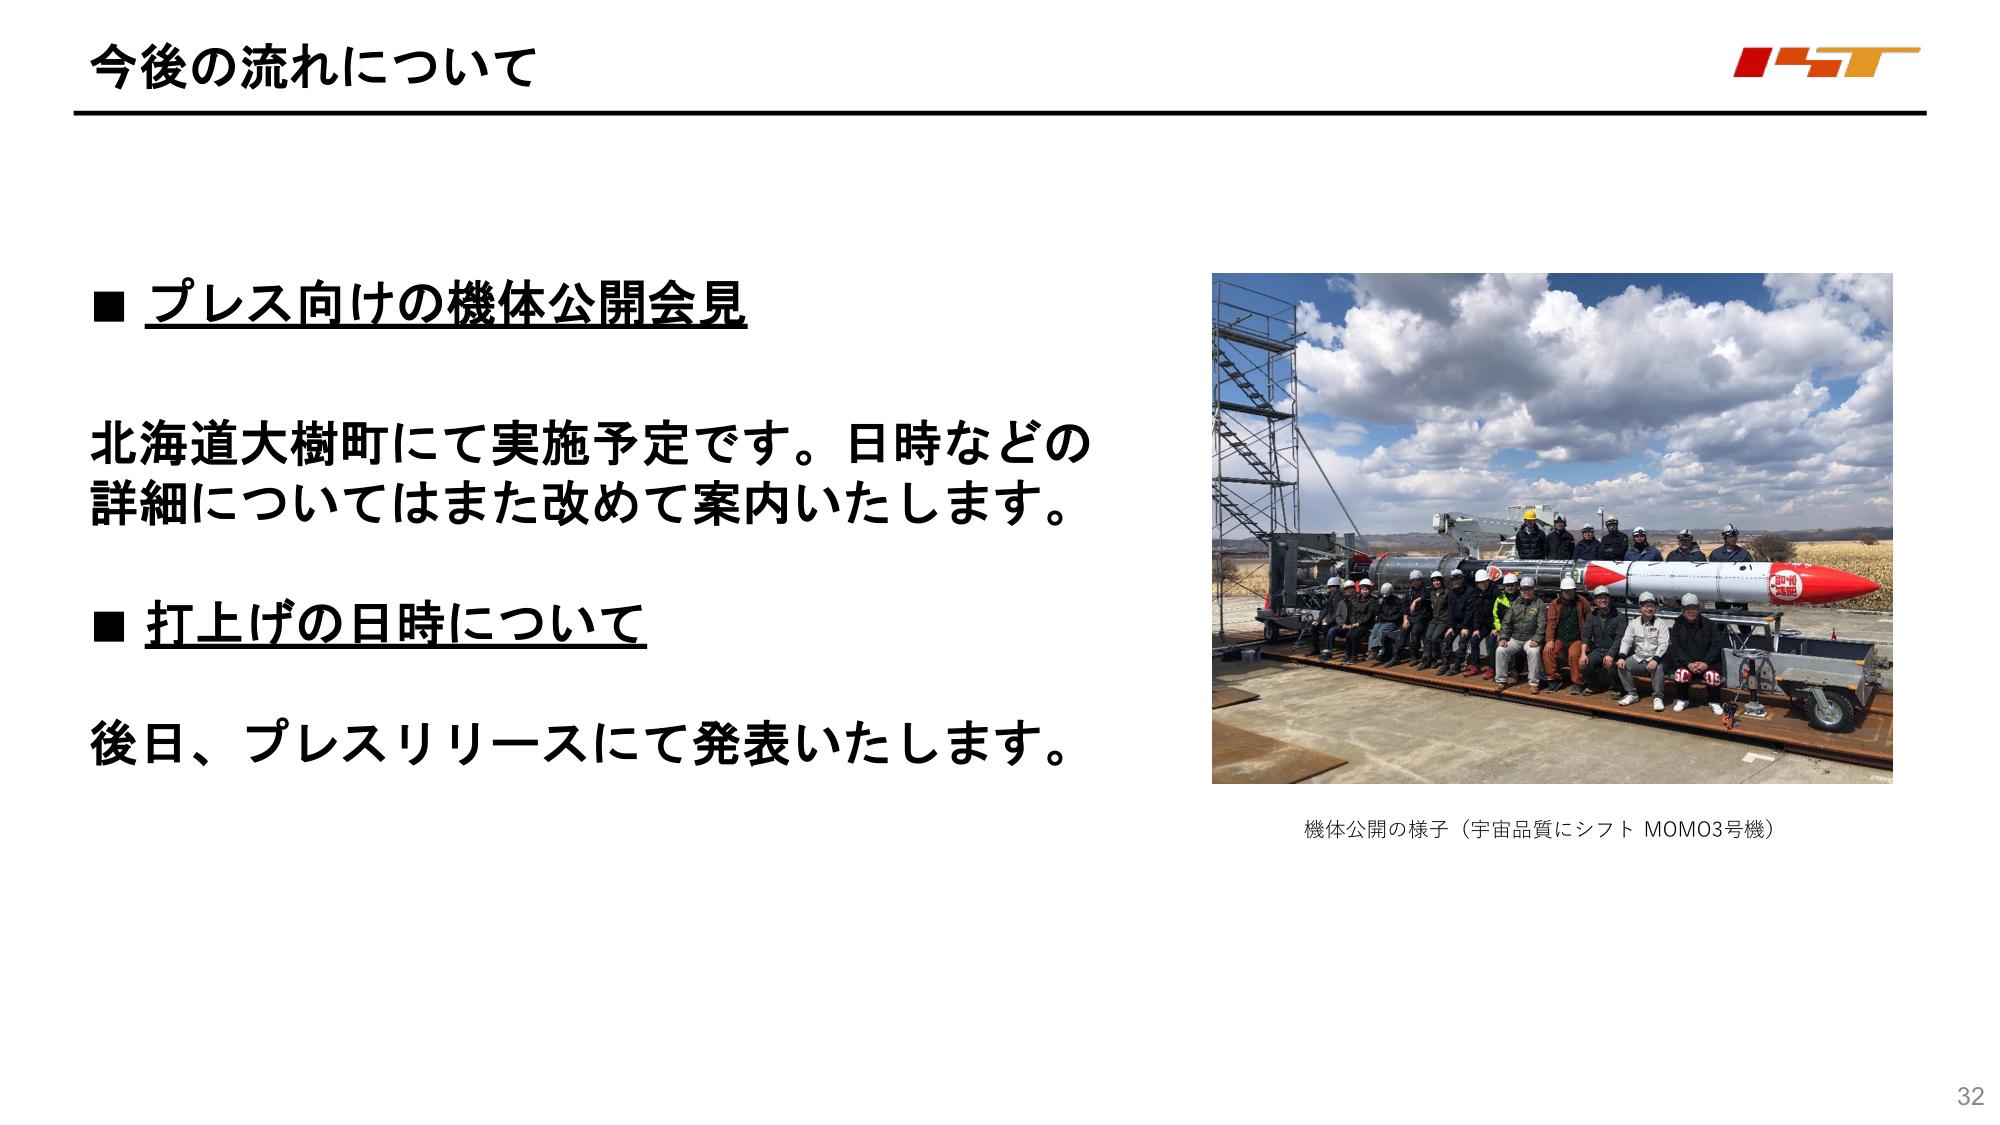 f:id:Imamura:20191126135324p:plain